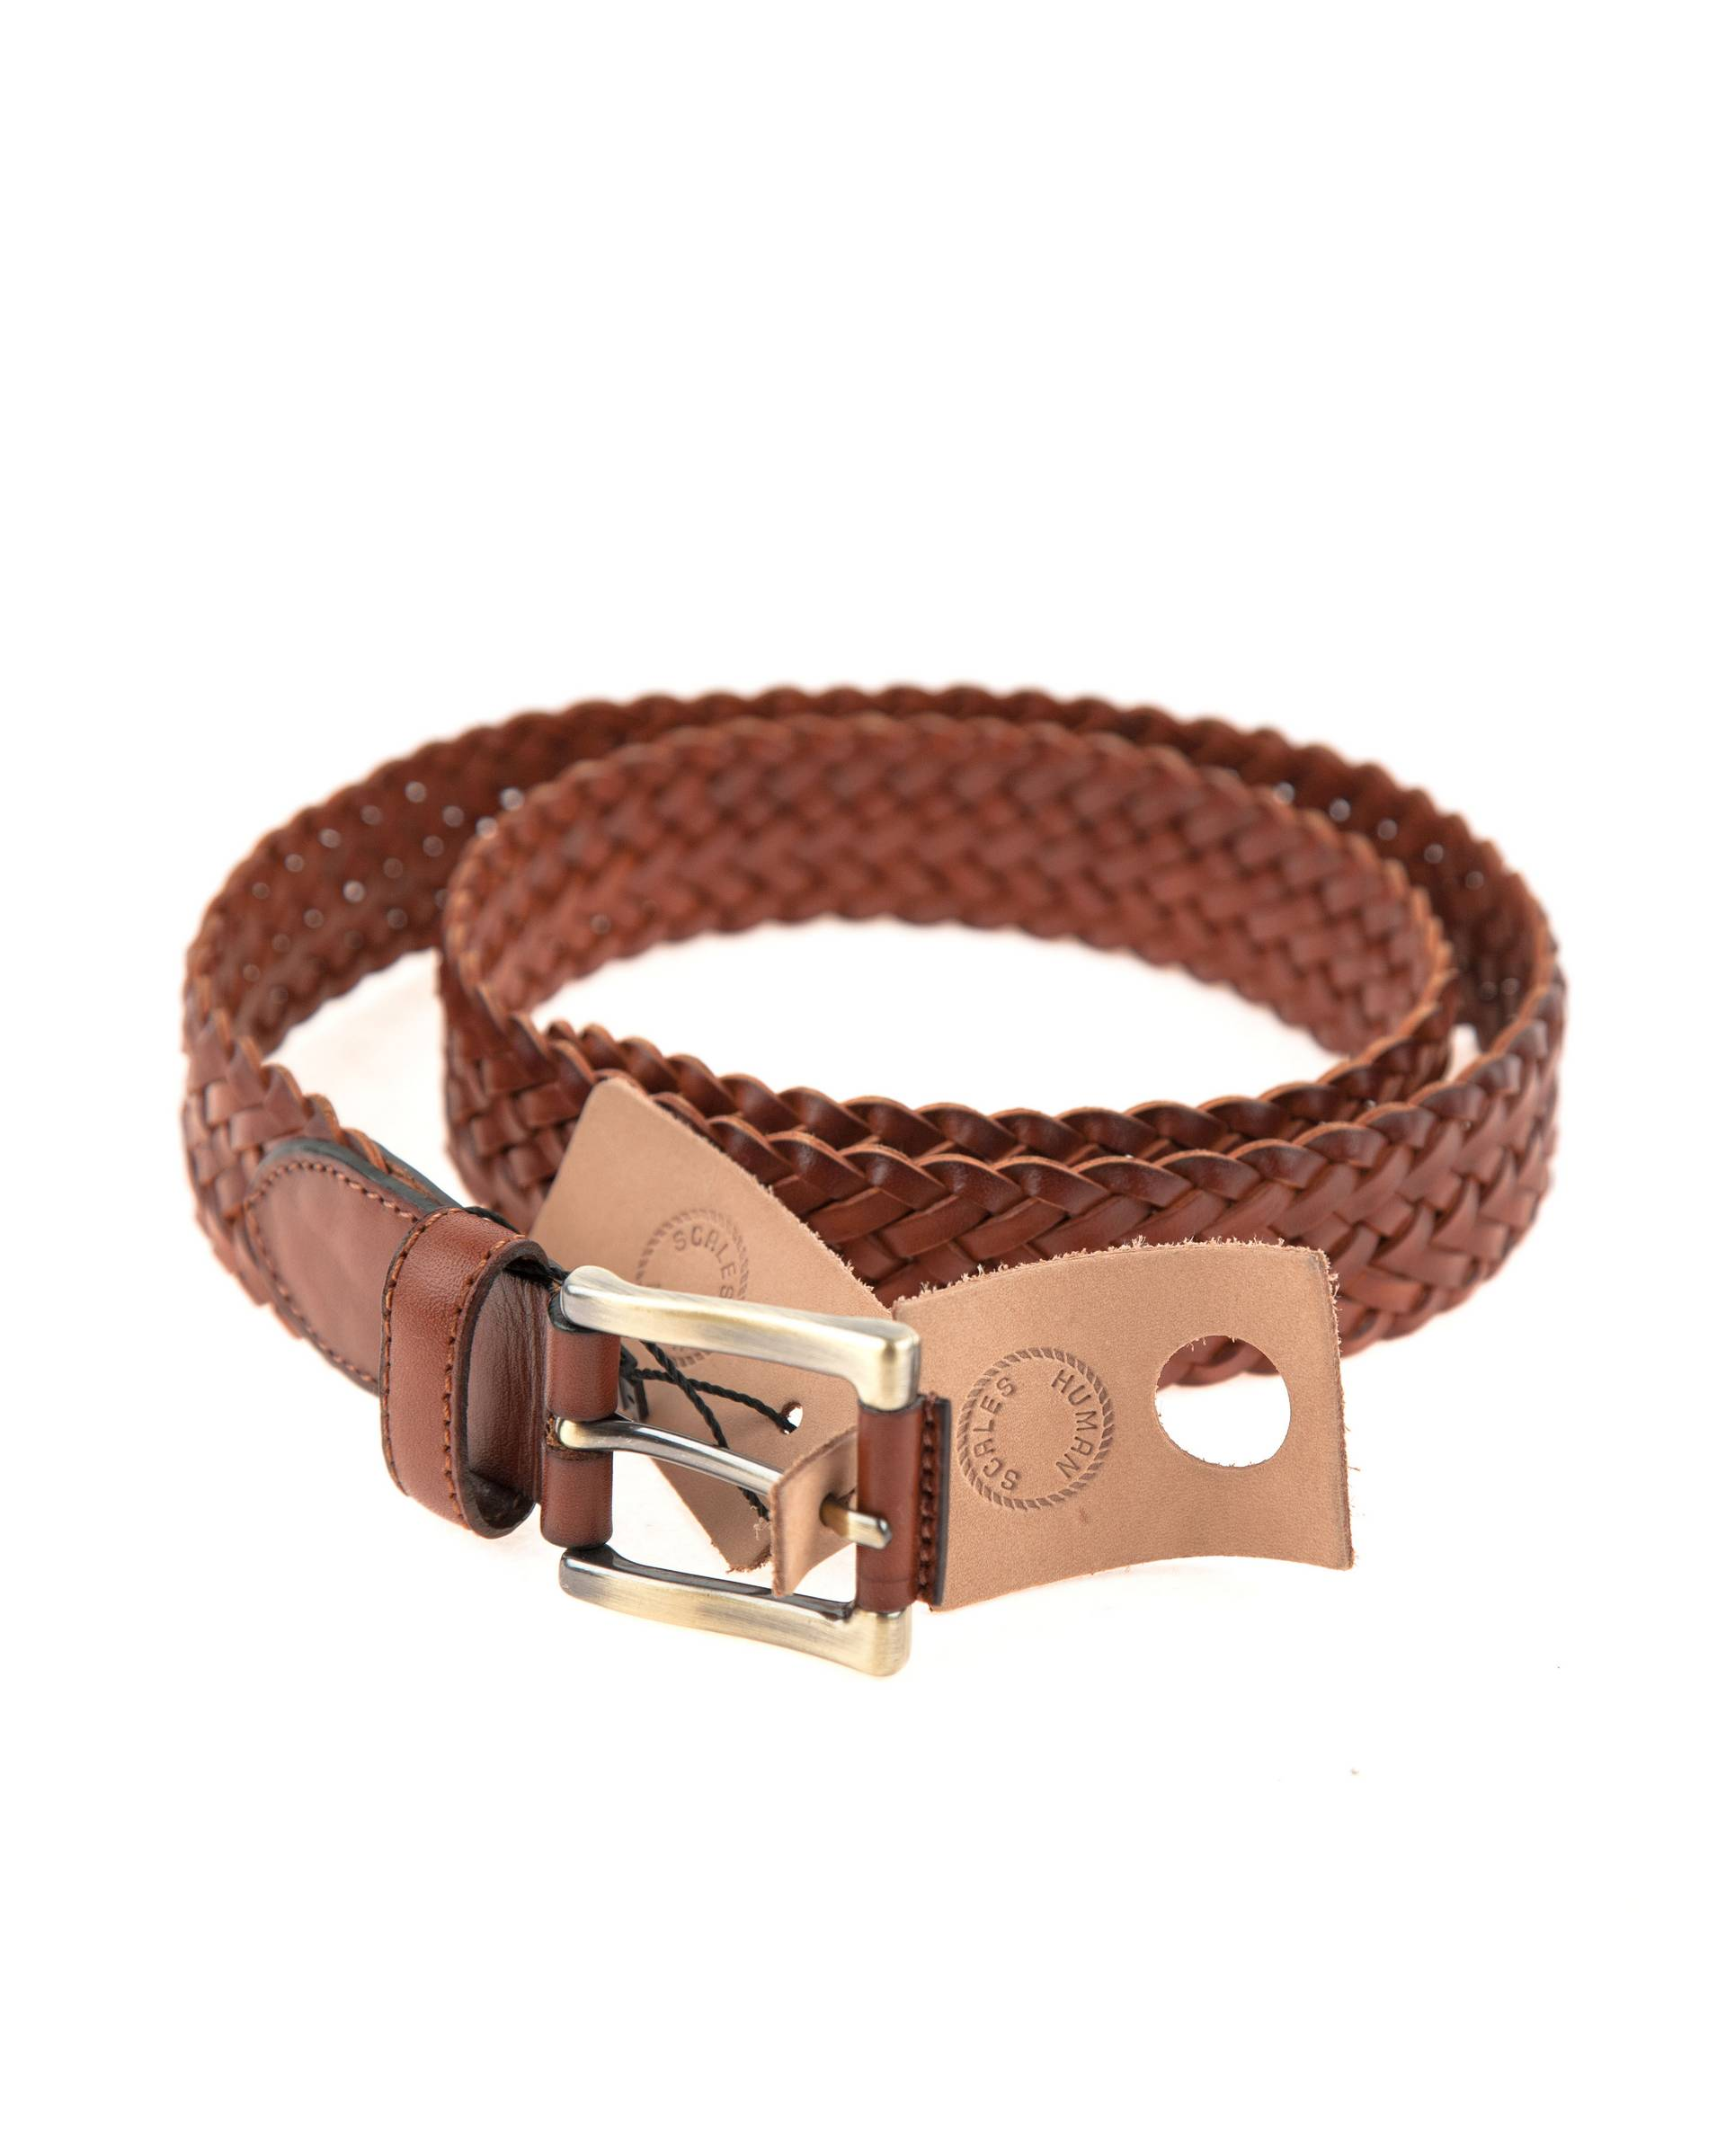 Ремень Human Scales Light Brown Leather Belt